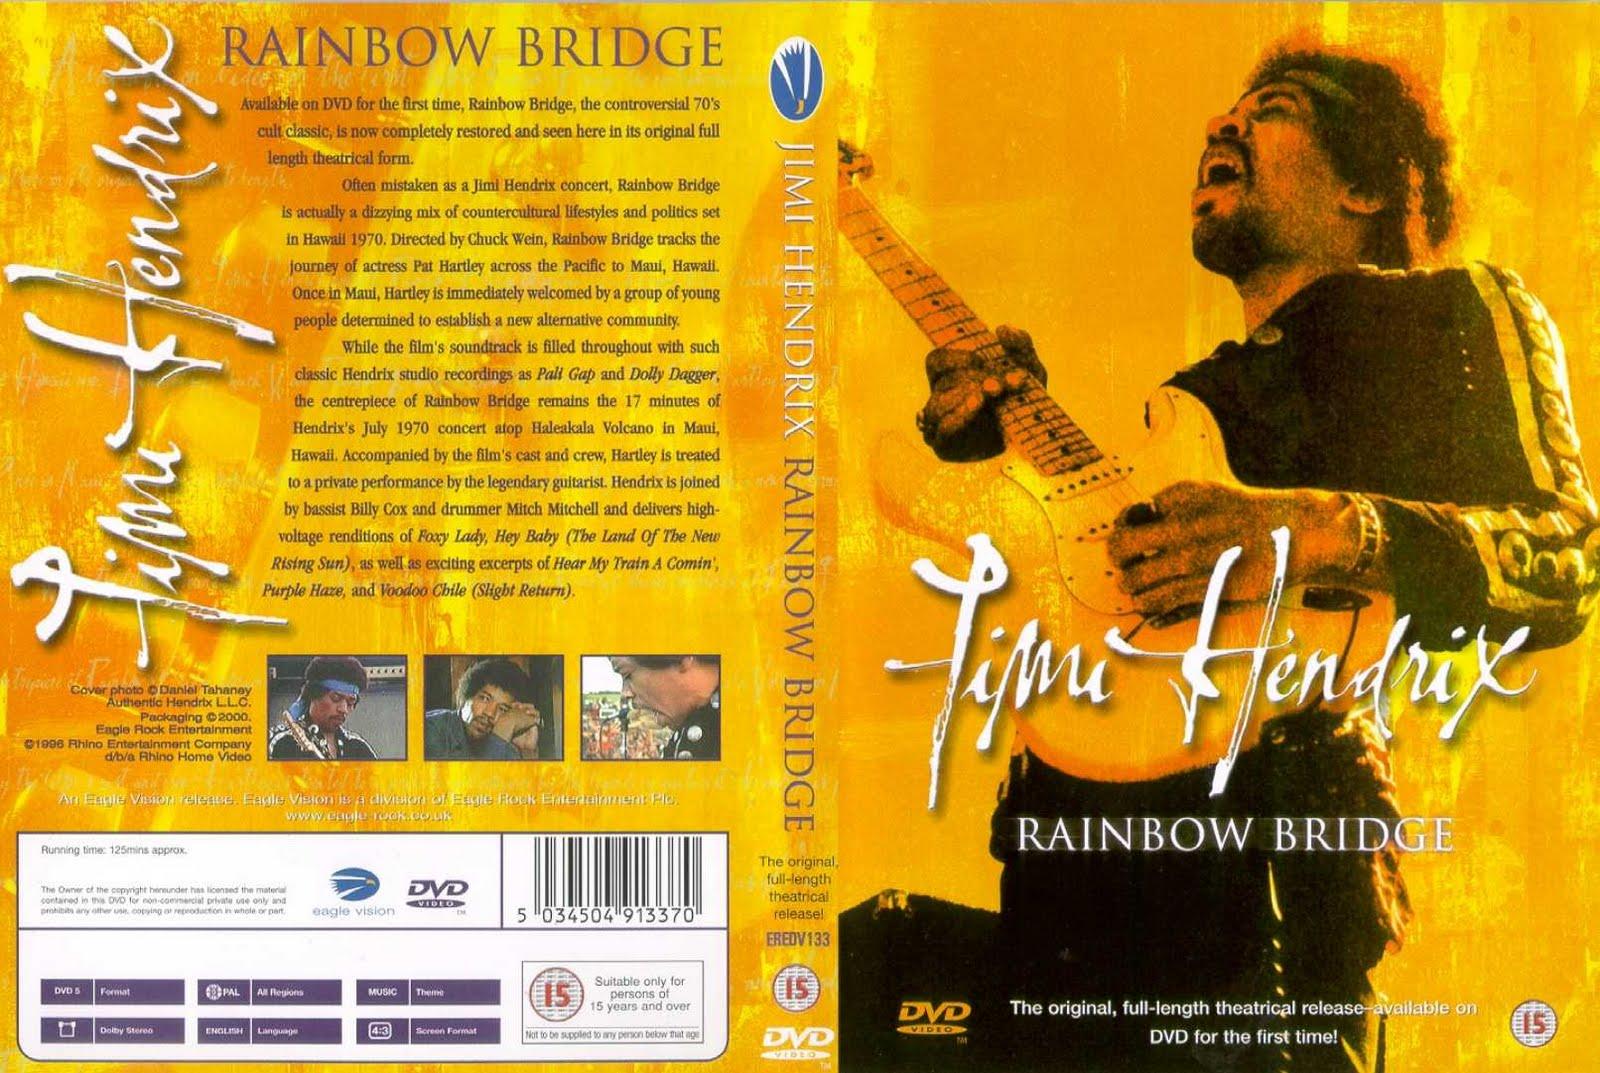 http://4.bp.blogspot.com/_se0zHB8H7oU/S_MnRxbbGoI/AAAAAAAACjk/lrF3gpC2aaw/s1600/Jimi+Hendrix+-+Rainbow+Bridge+-+Cover.jpg